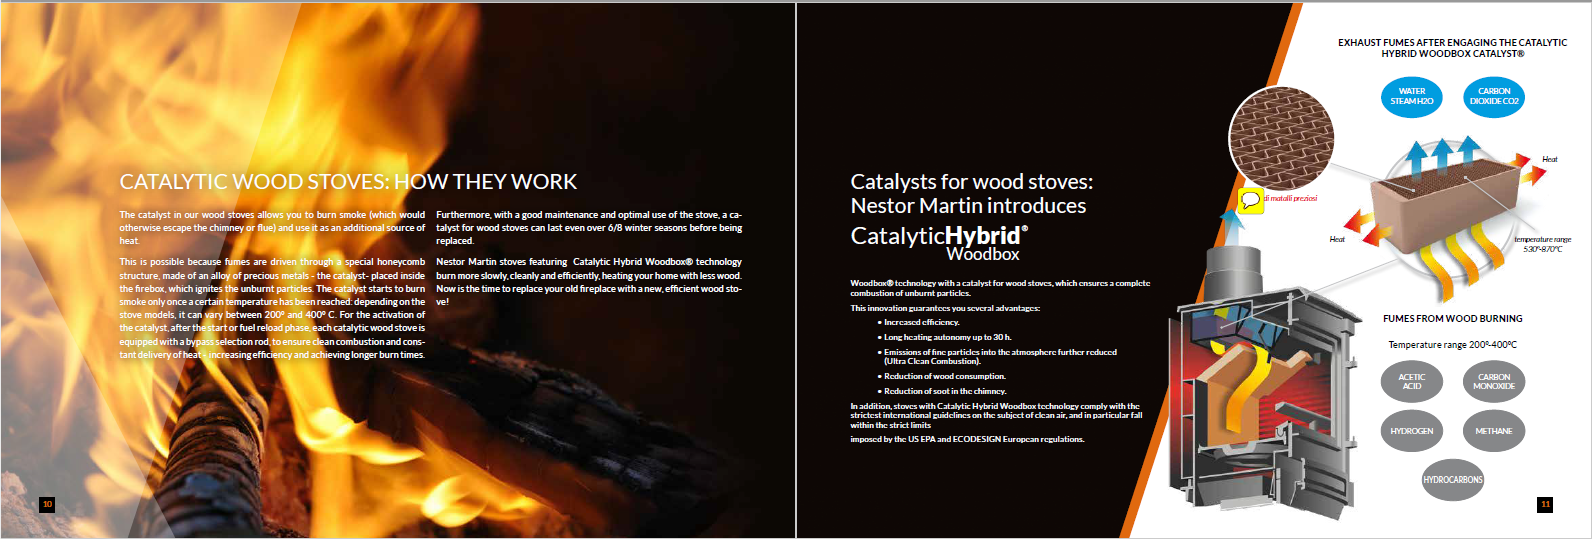 CatalyticHybrid Information